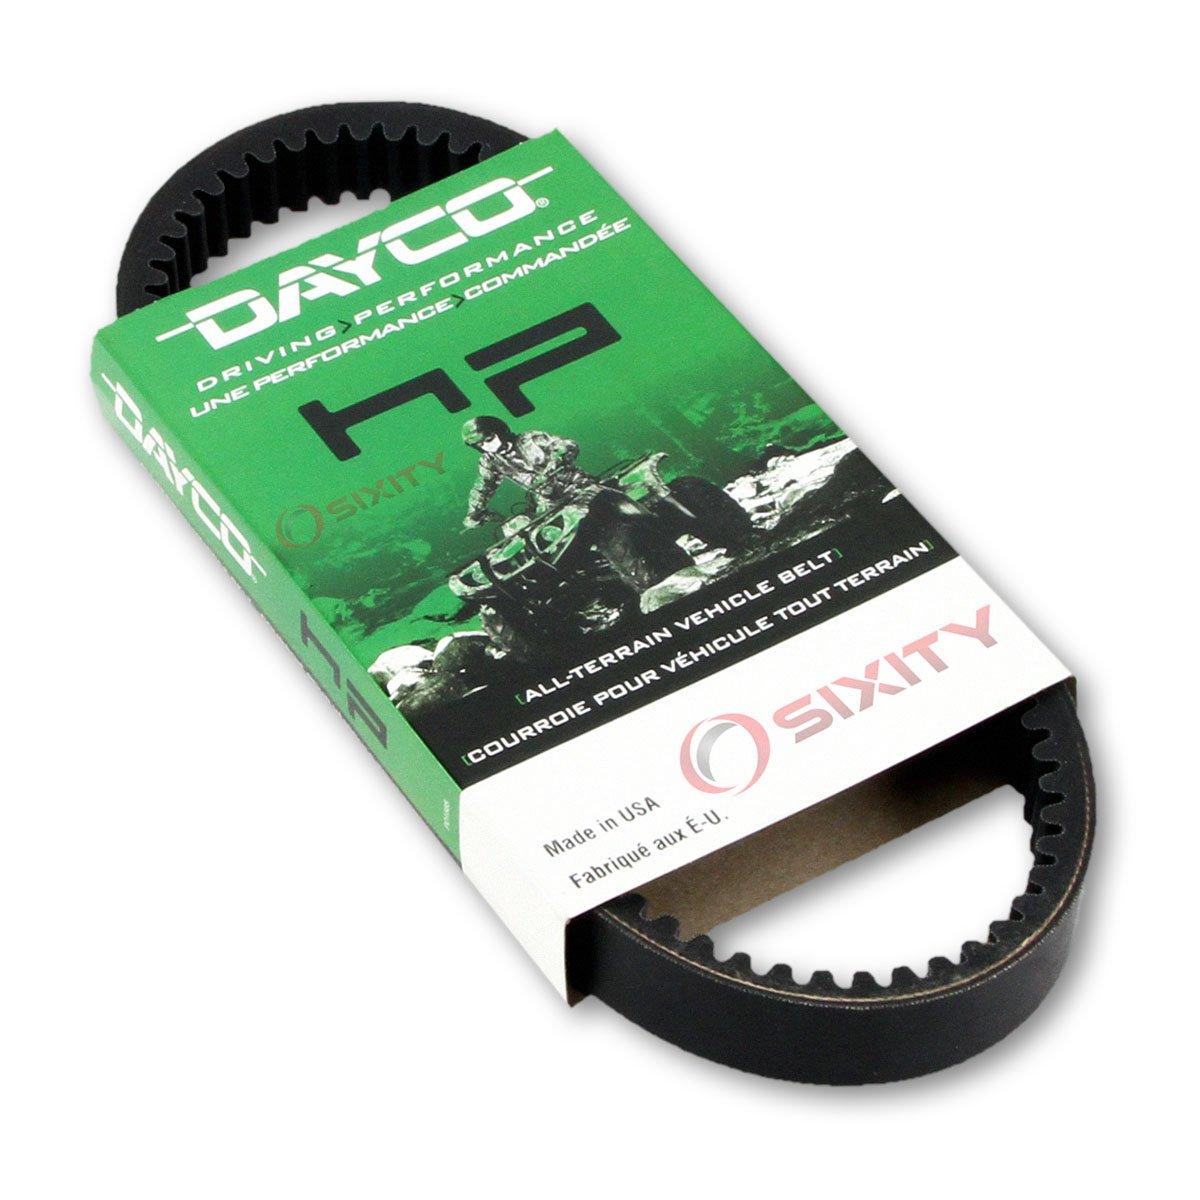 1997-2001 Kawasaki KAF300 Mule 550 Drive Belt Dayco HP ATV OEM Upgrade Replacement Transmission Belts